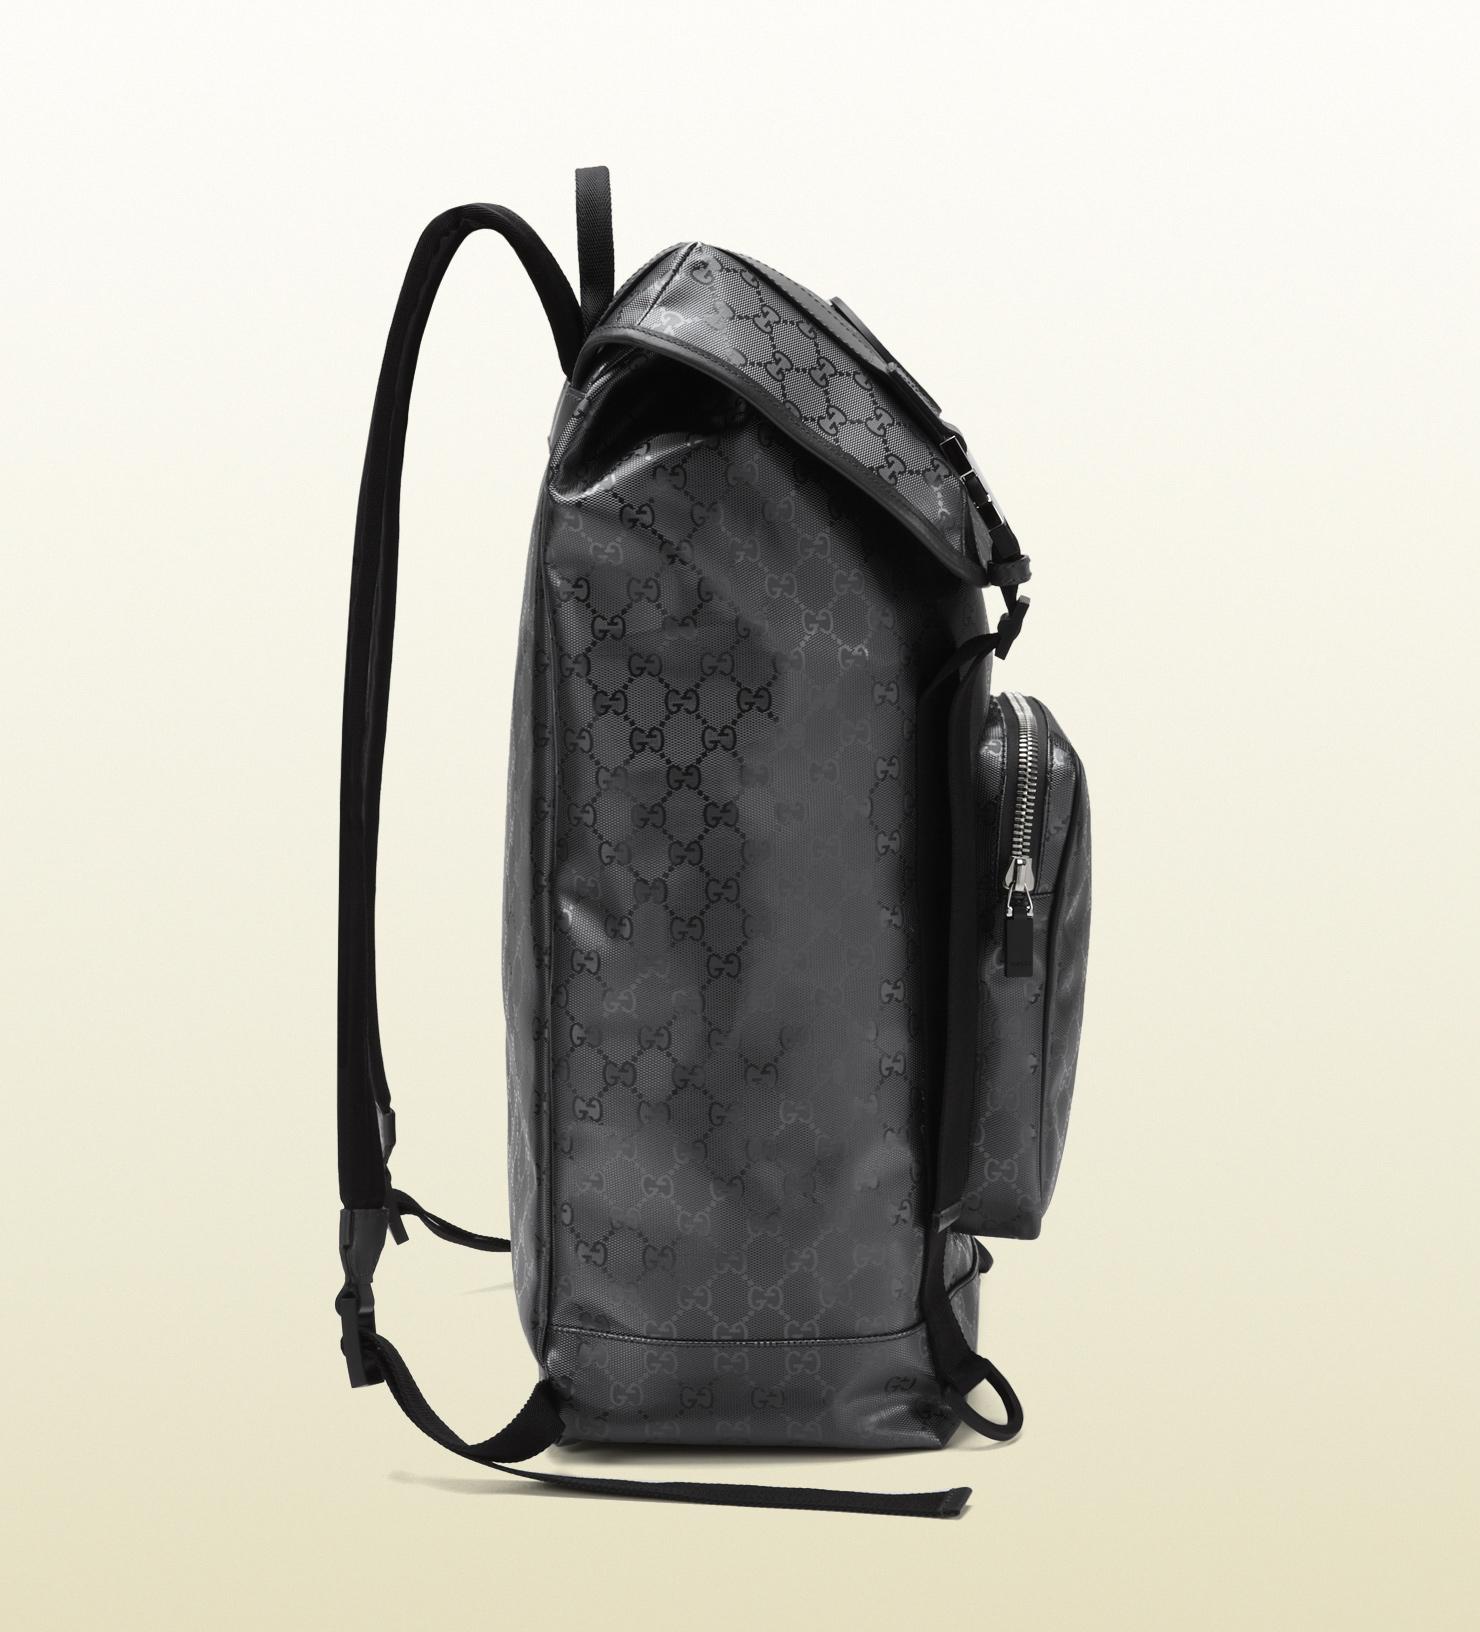 4c672bf5d20 Lyst - Gucci Gg Imprime Interlocking G Backpack in Black for Men